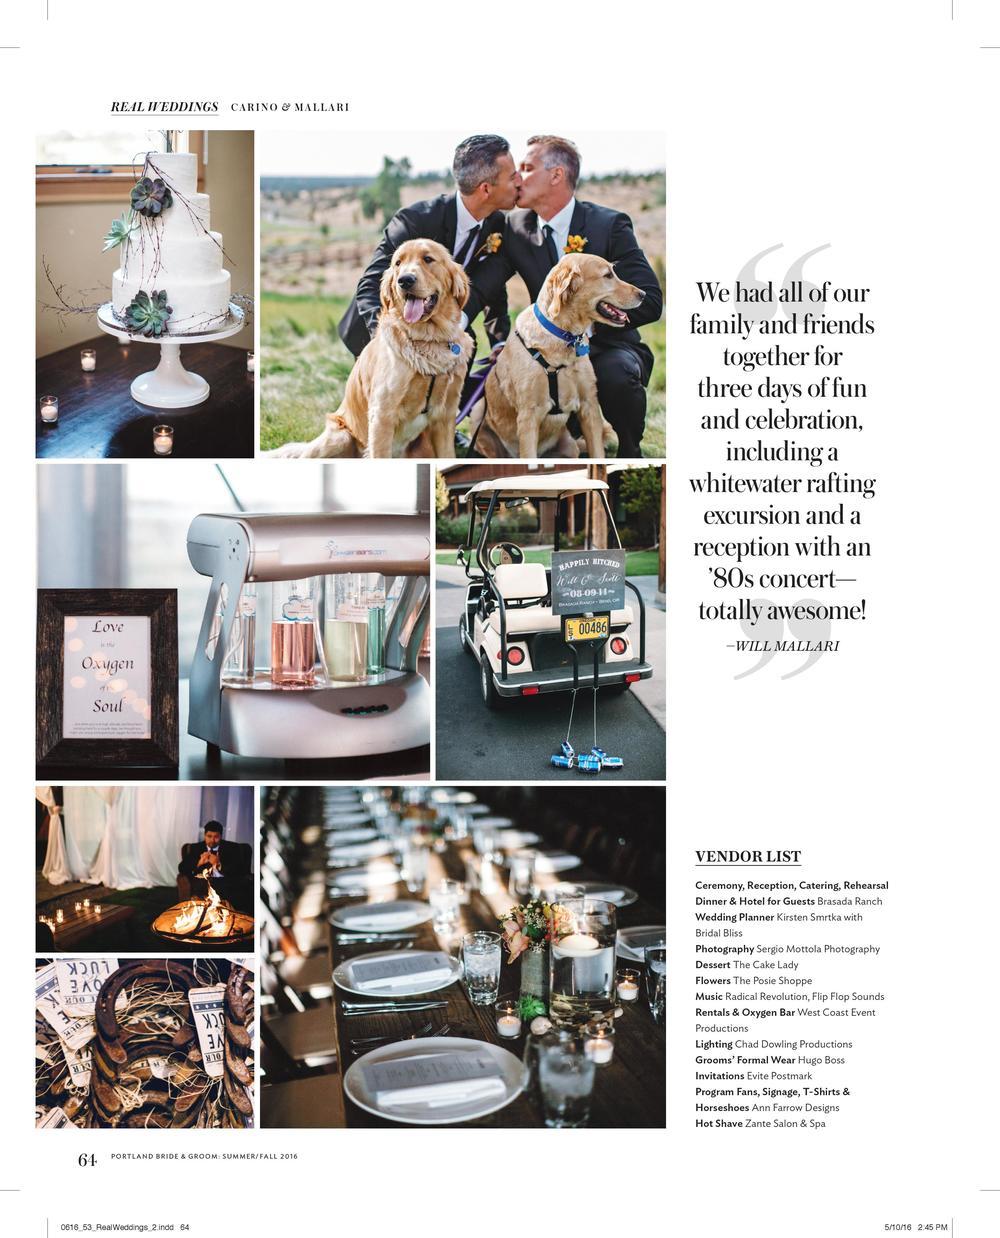 Bridalbliss.com | Bend Wedding Planner | Central Oregon Oregon Event Design | Sergio Mottola Photography